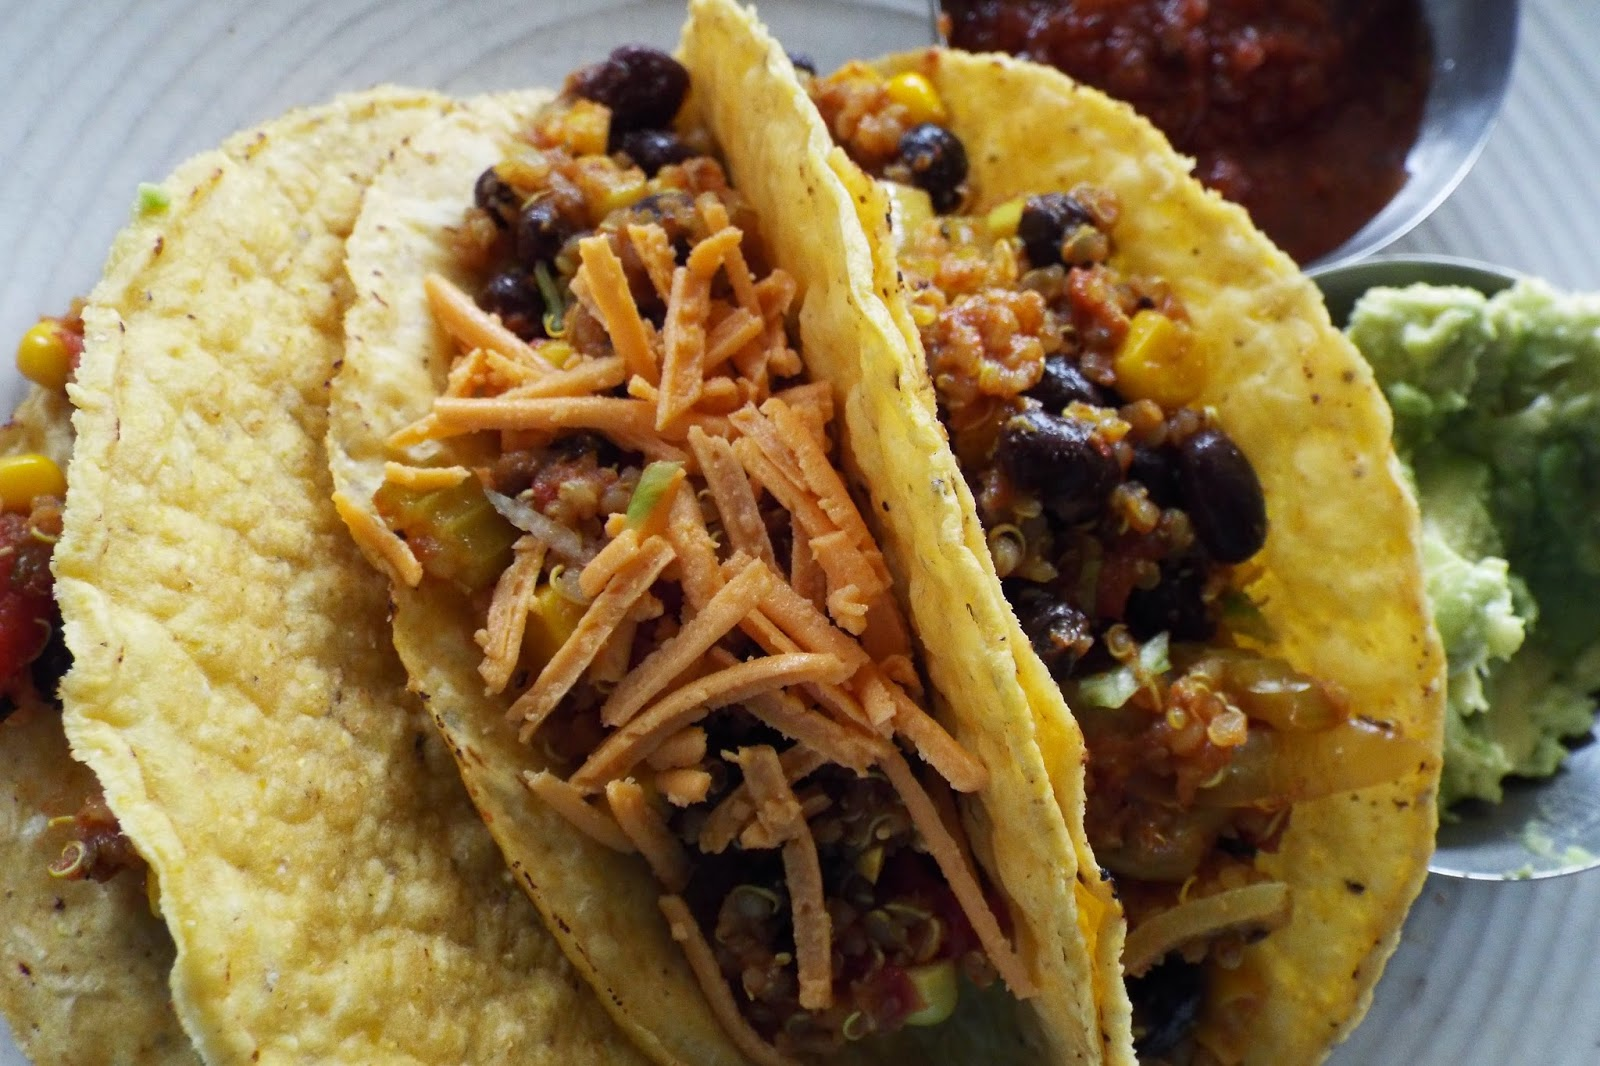 Vegan Quinoa Tacos with Black Beans, Corn and Guacamole ...